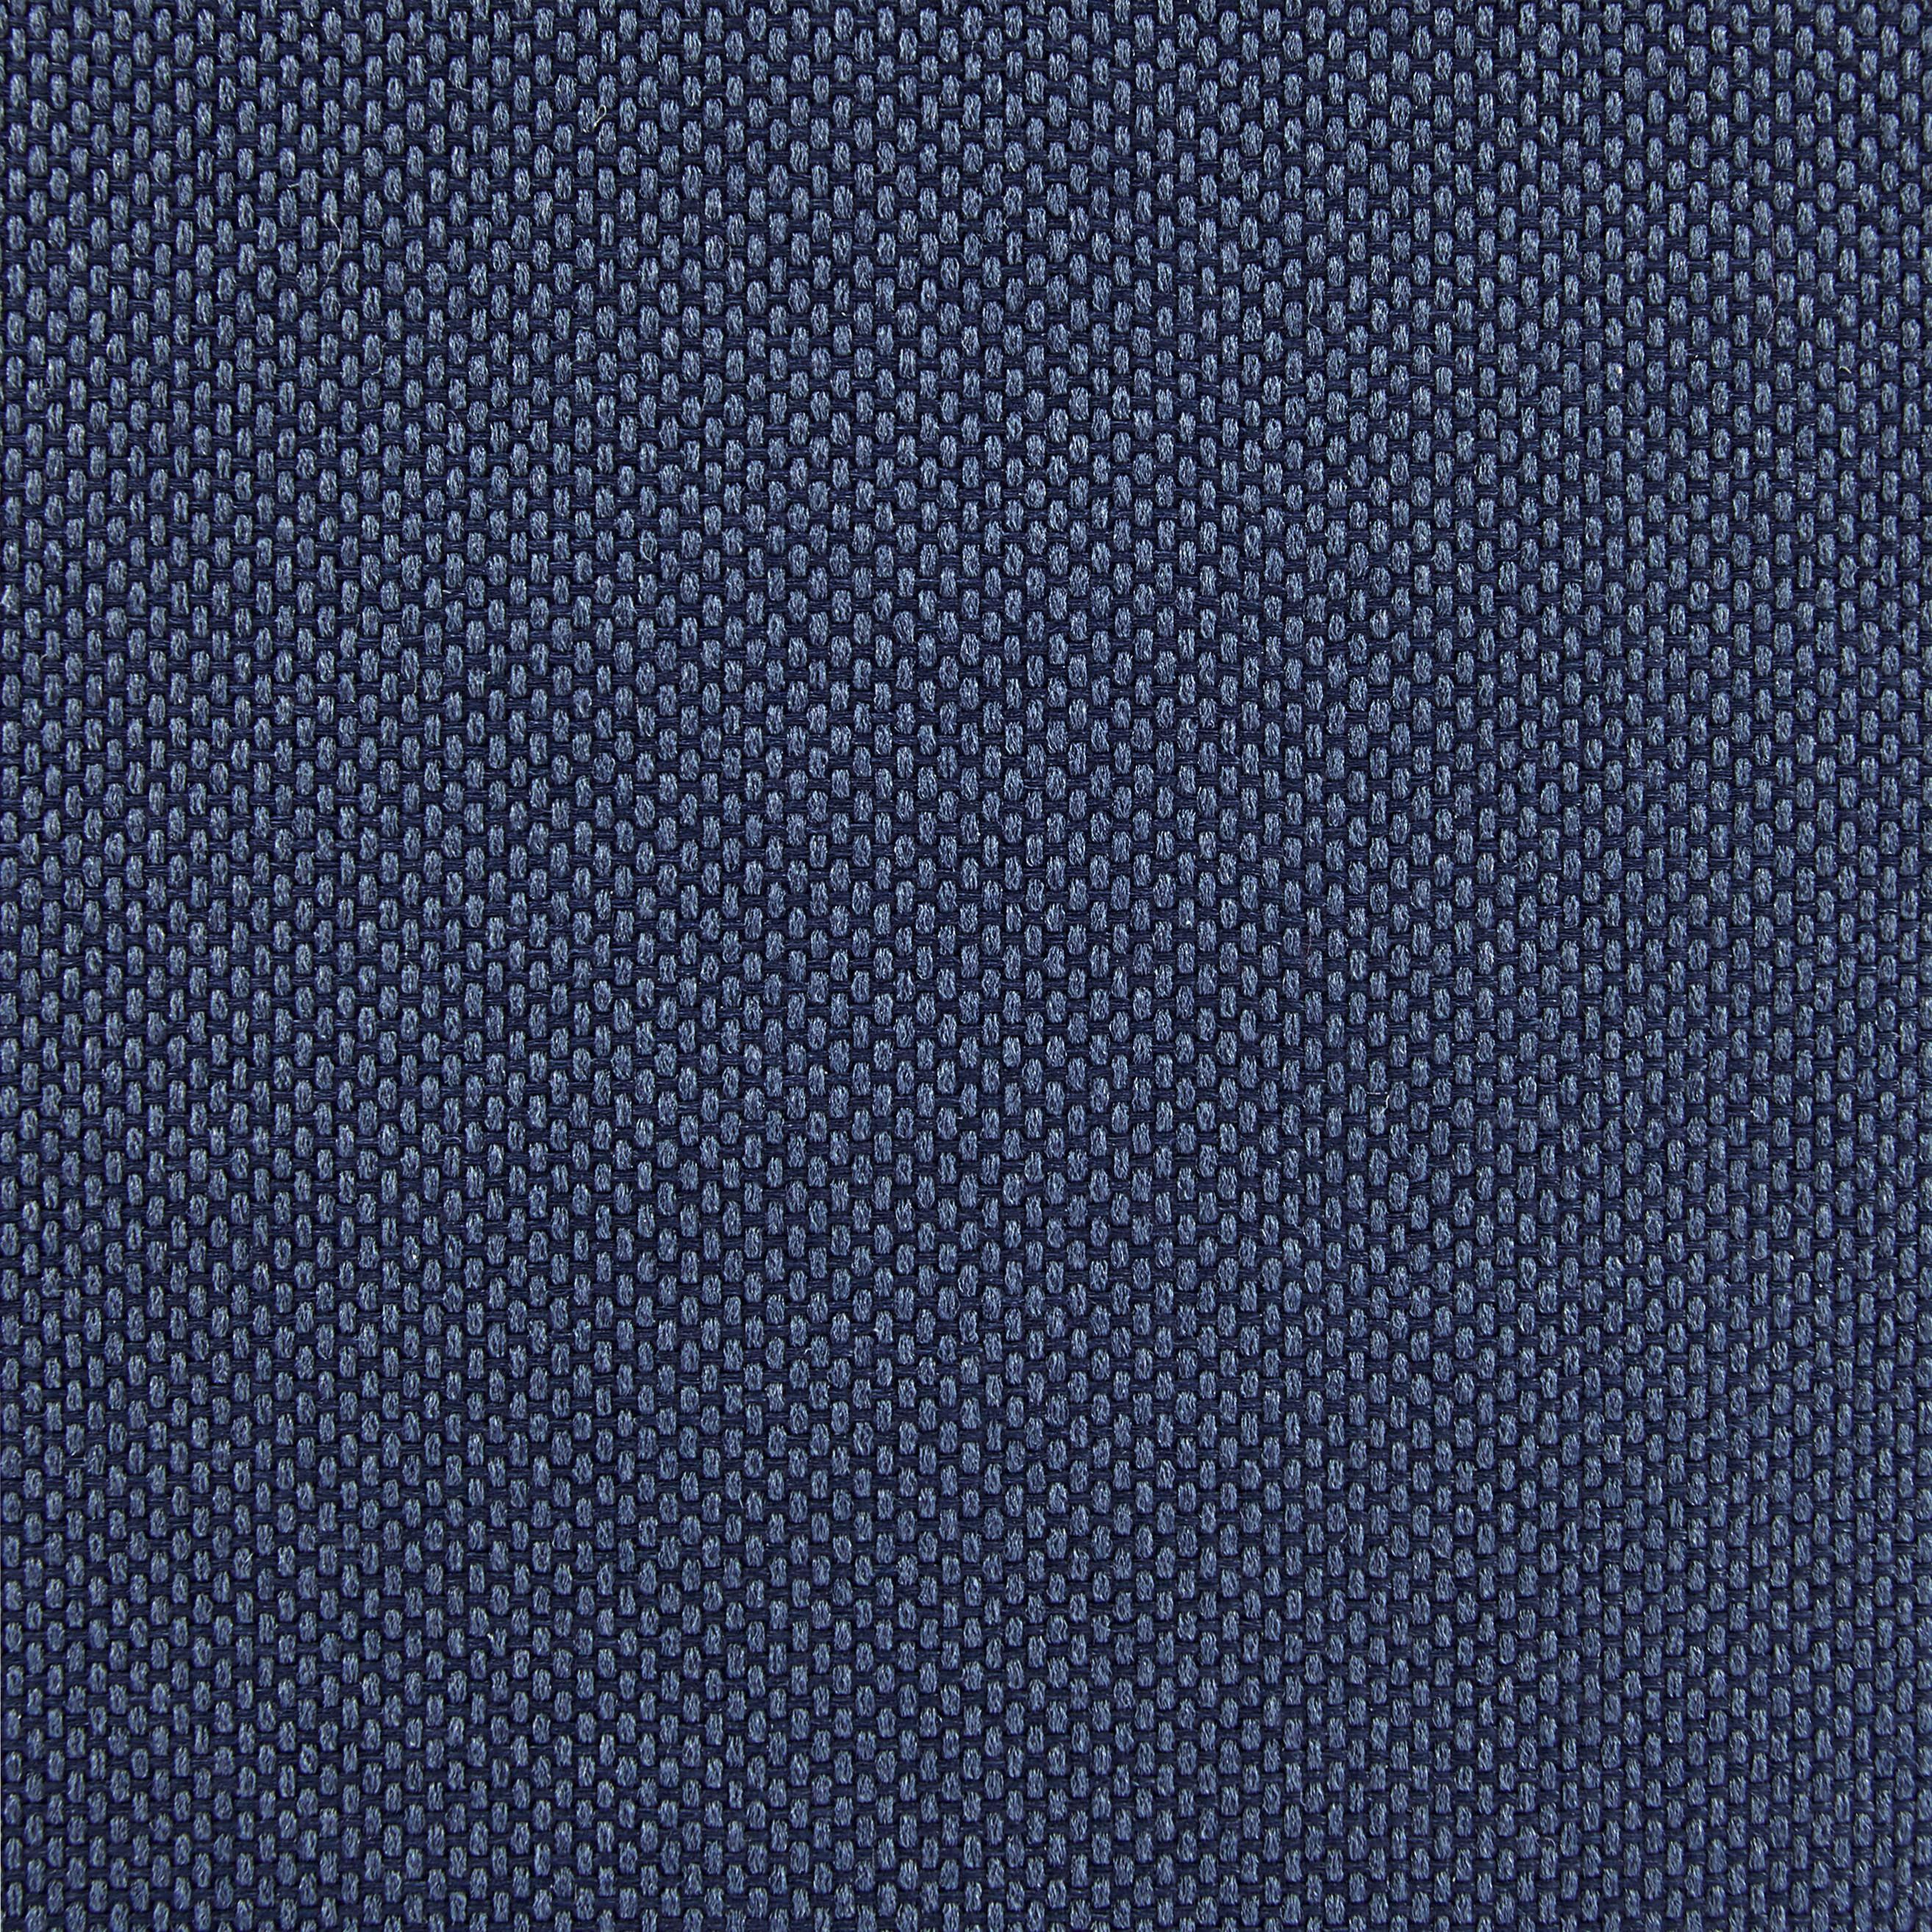 Outdoorsitzsack Kerim - Dunkelgrau, Textil (66/66/58cm) - MÖMAX modern living